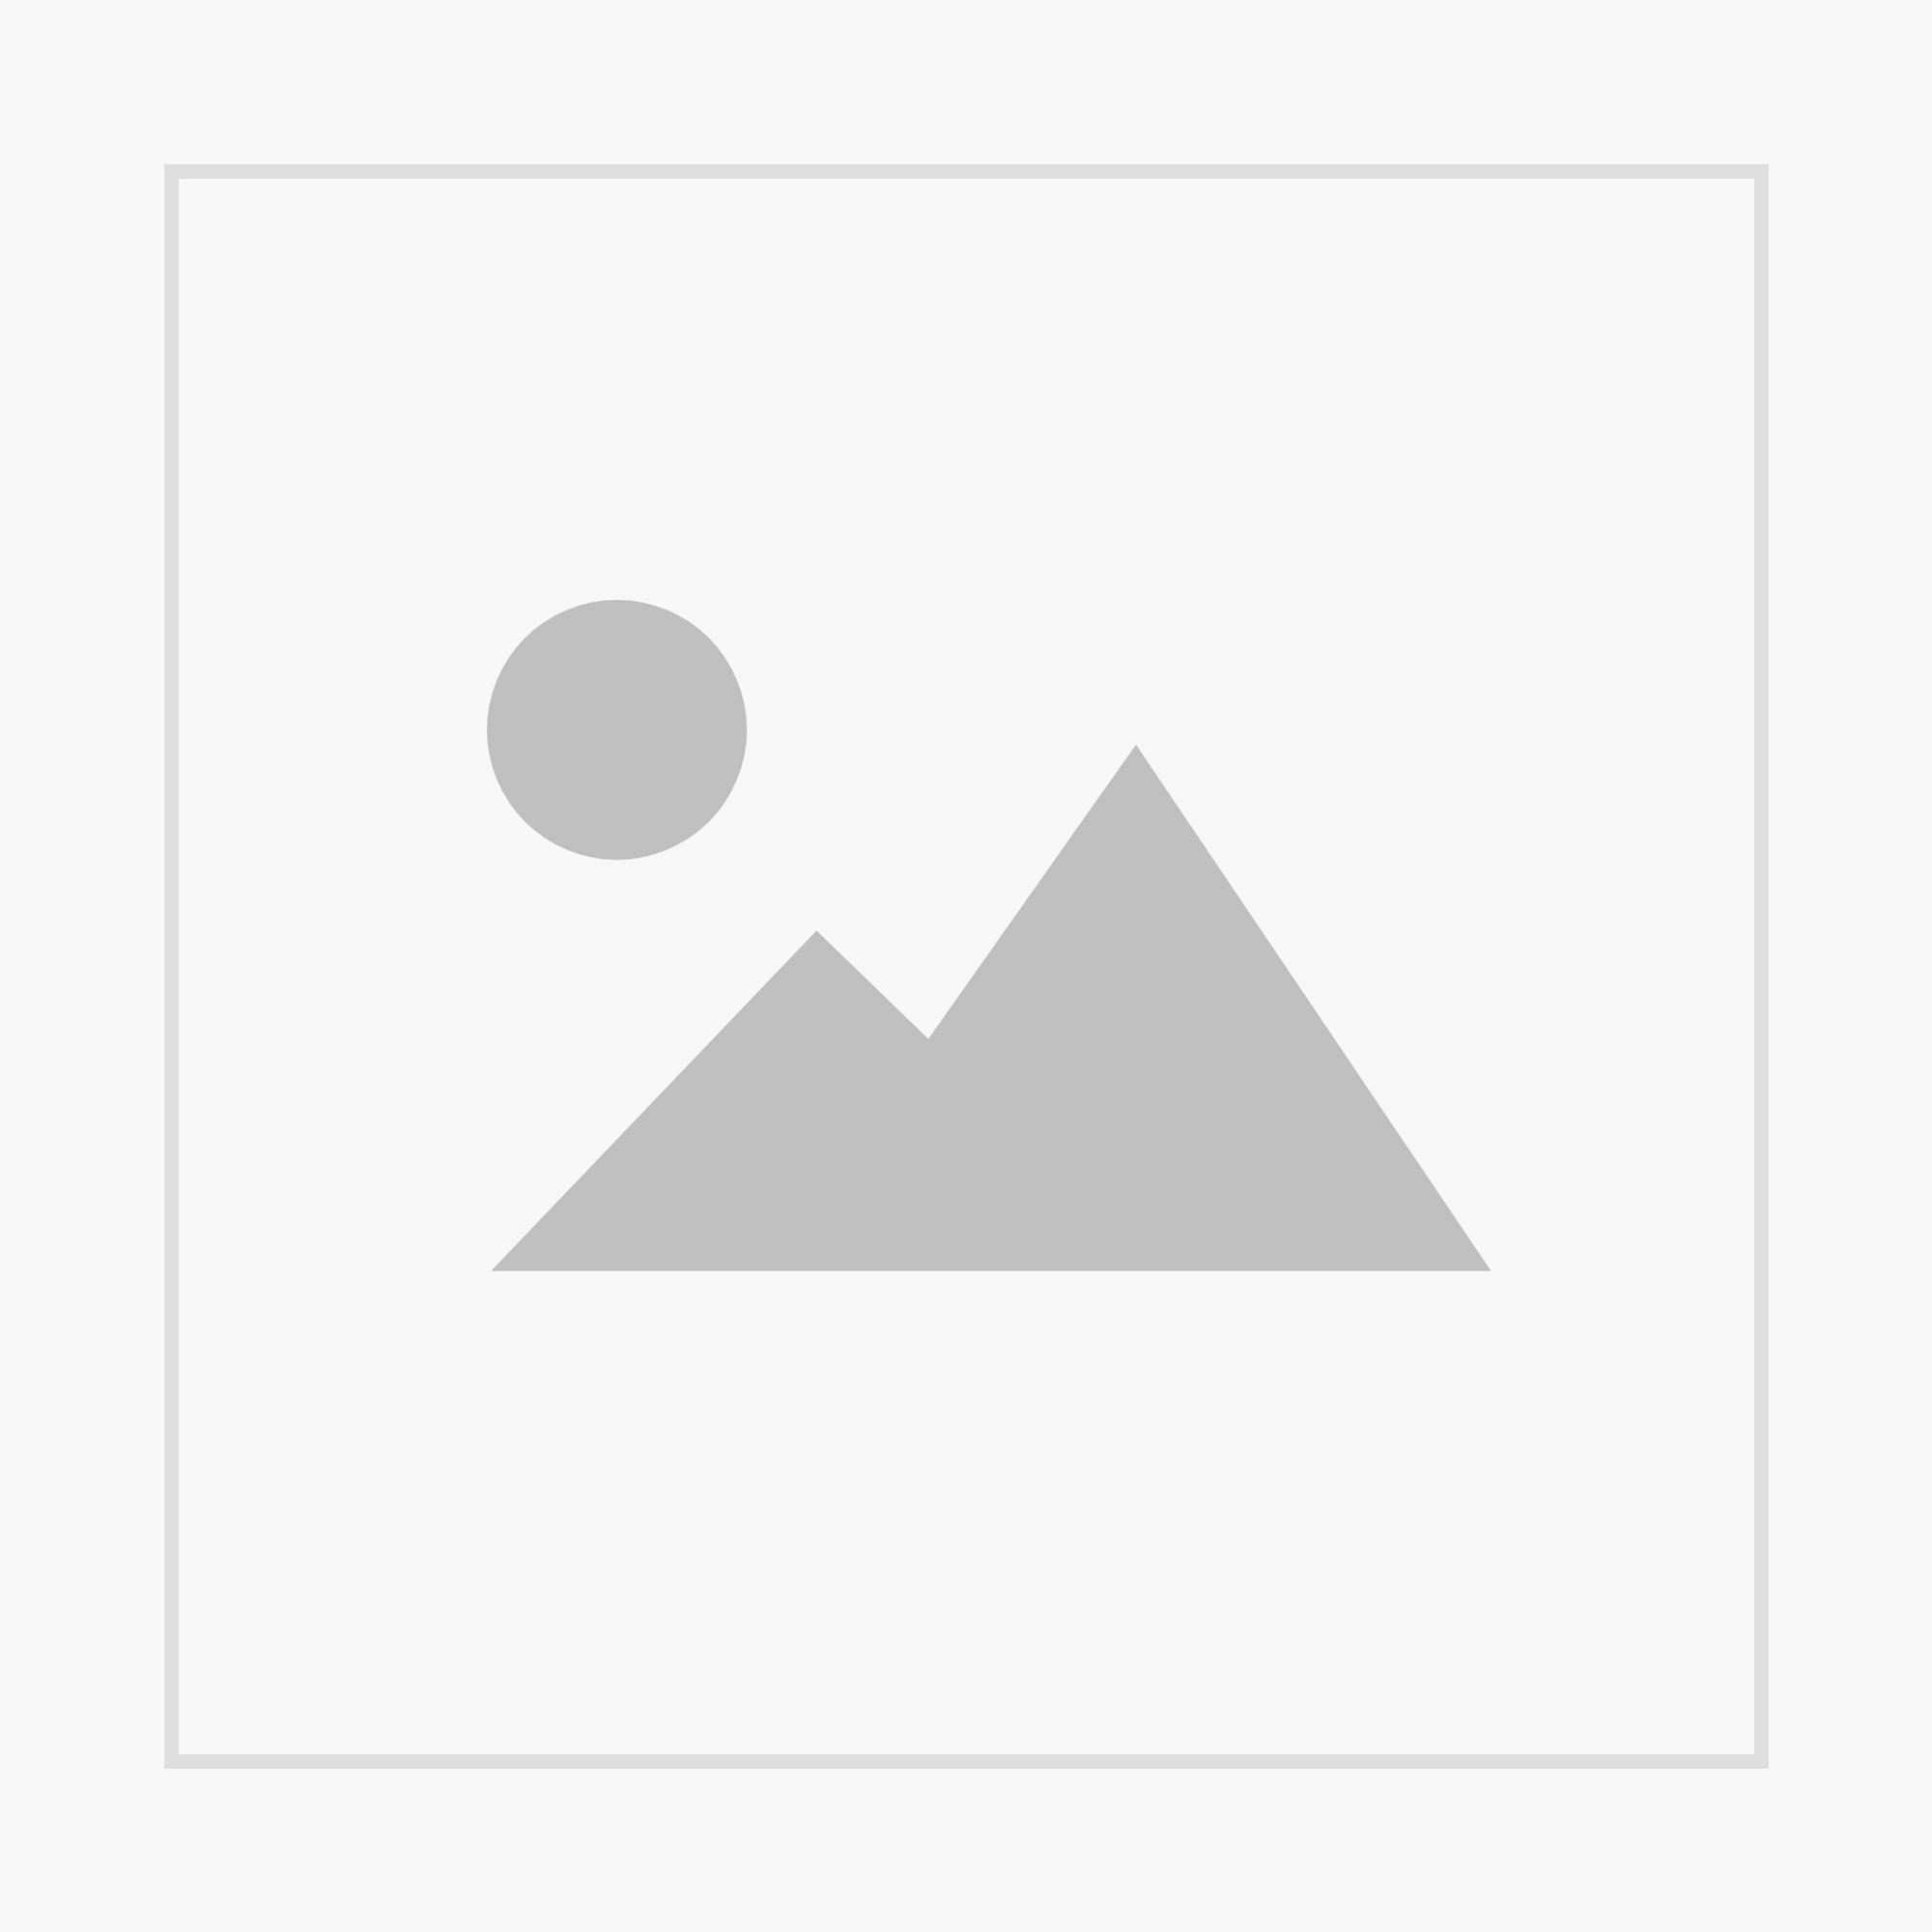 Landlust - Sofadecke mit Hunde-Motiv